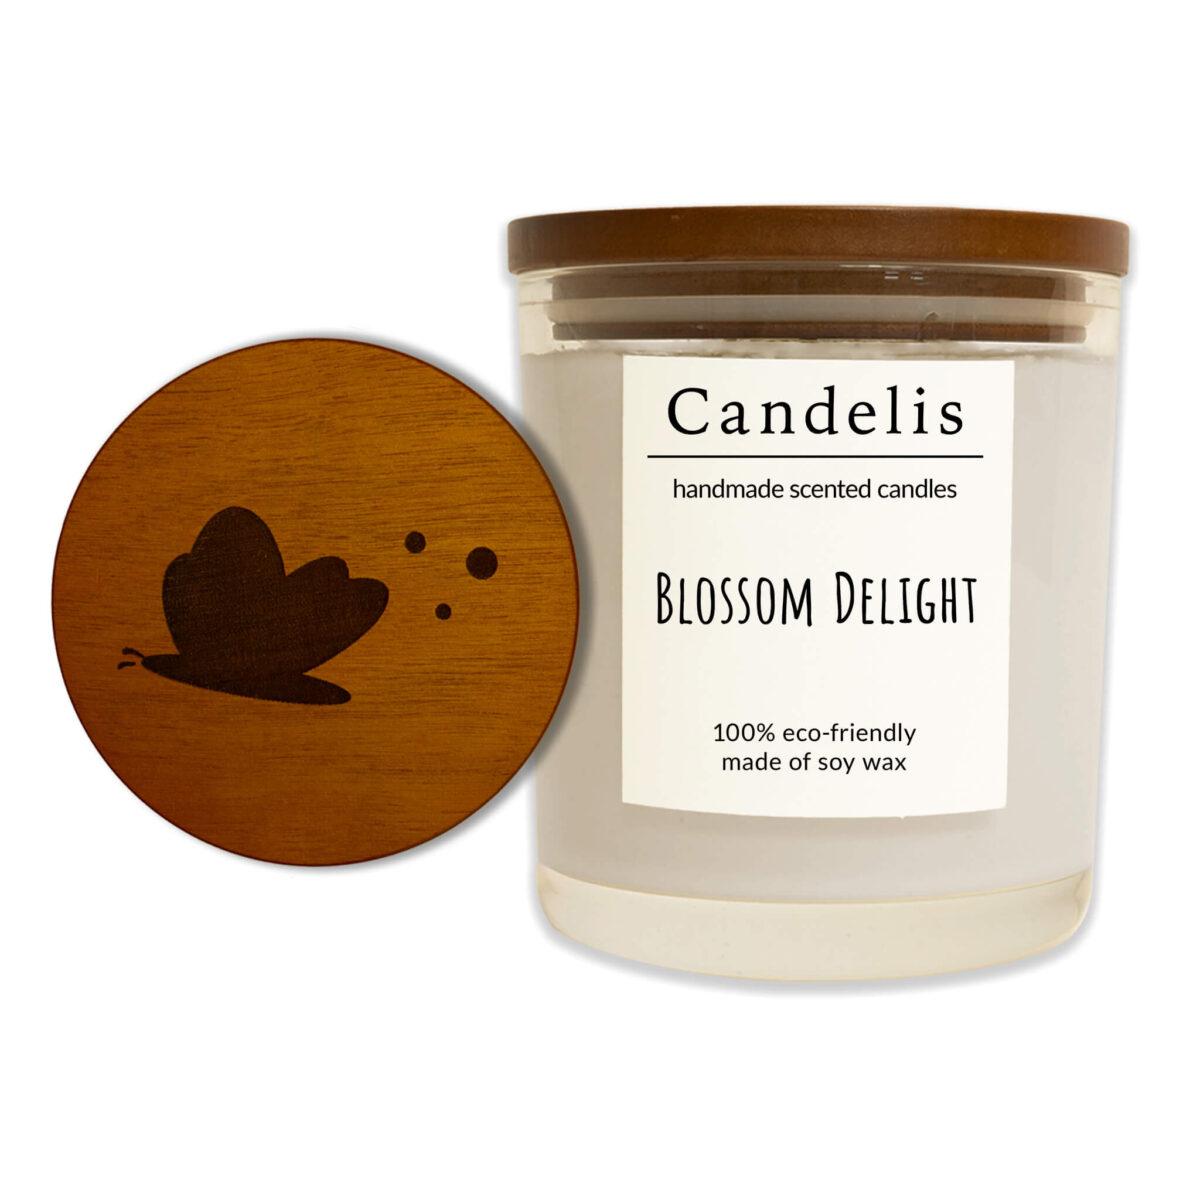 Blossom Delight basis collectie single